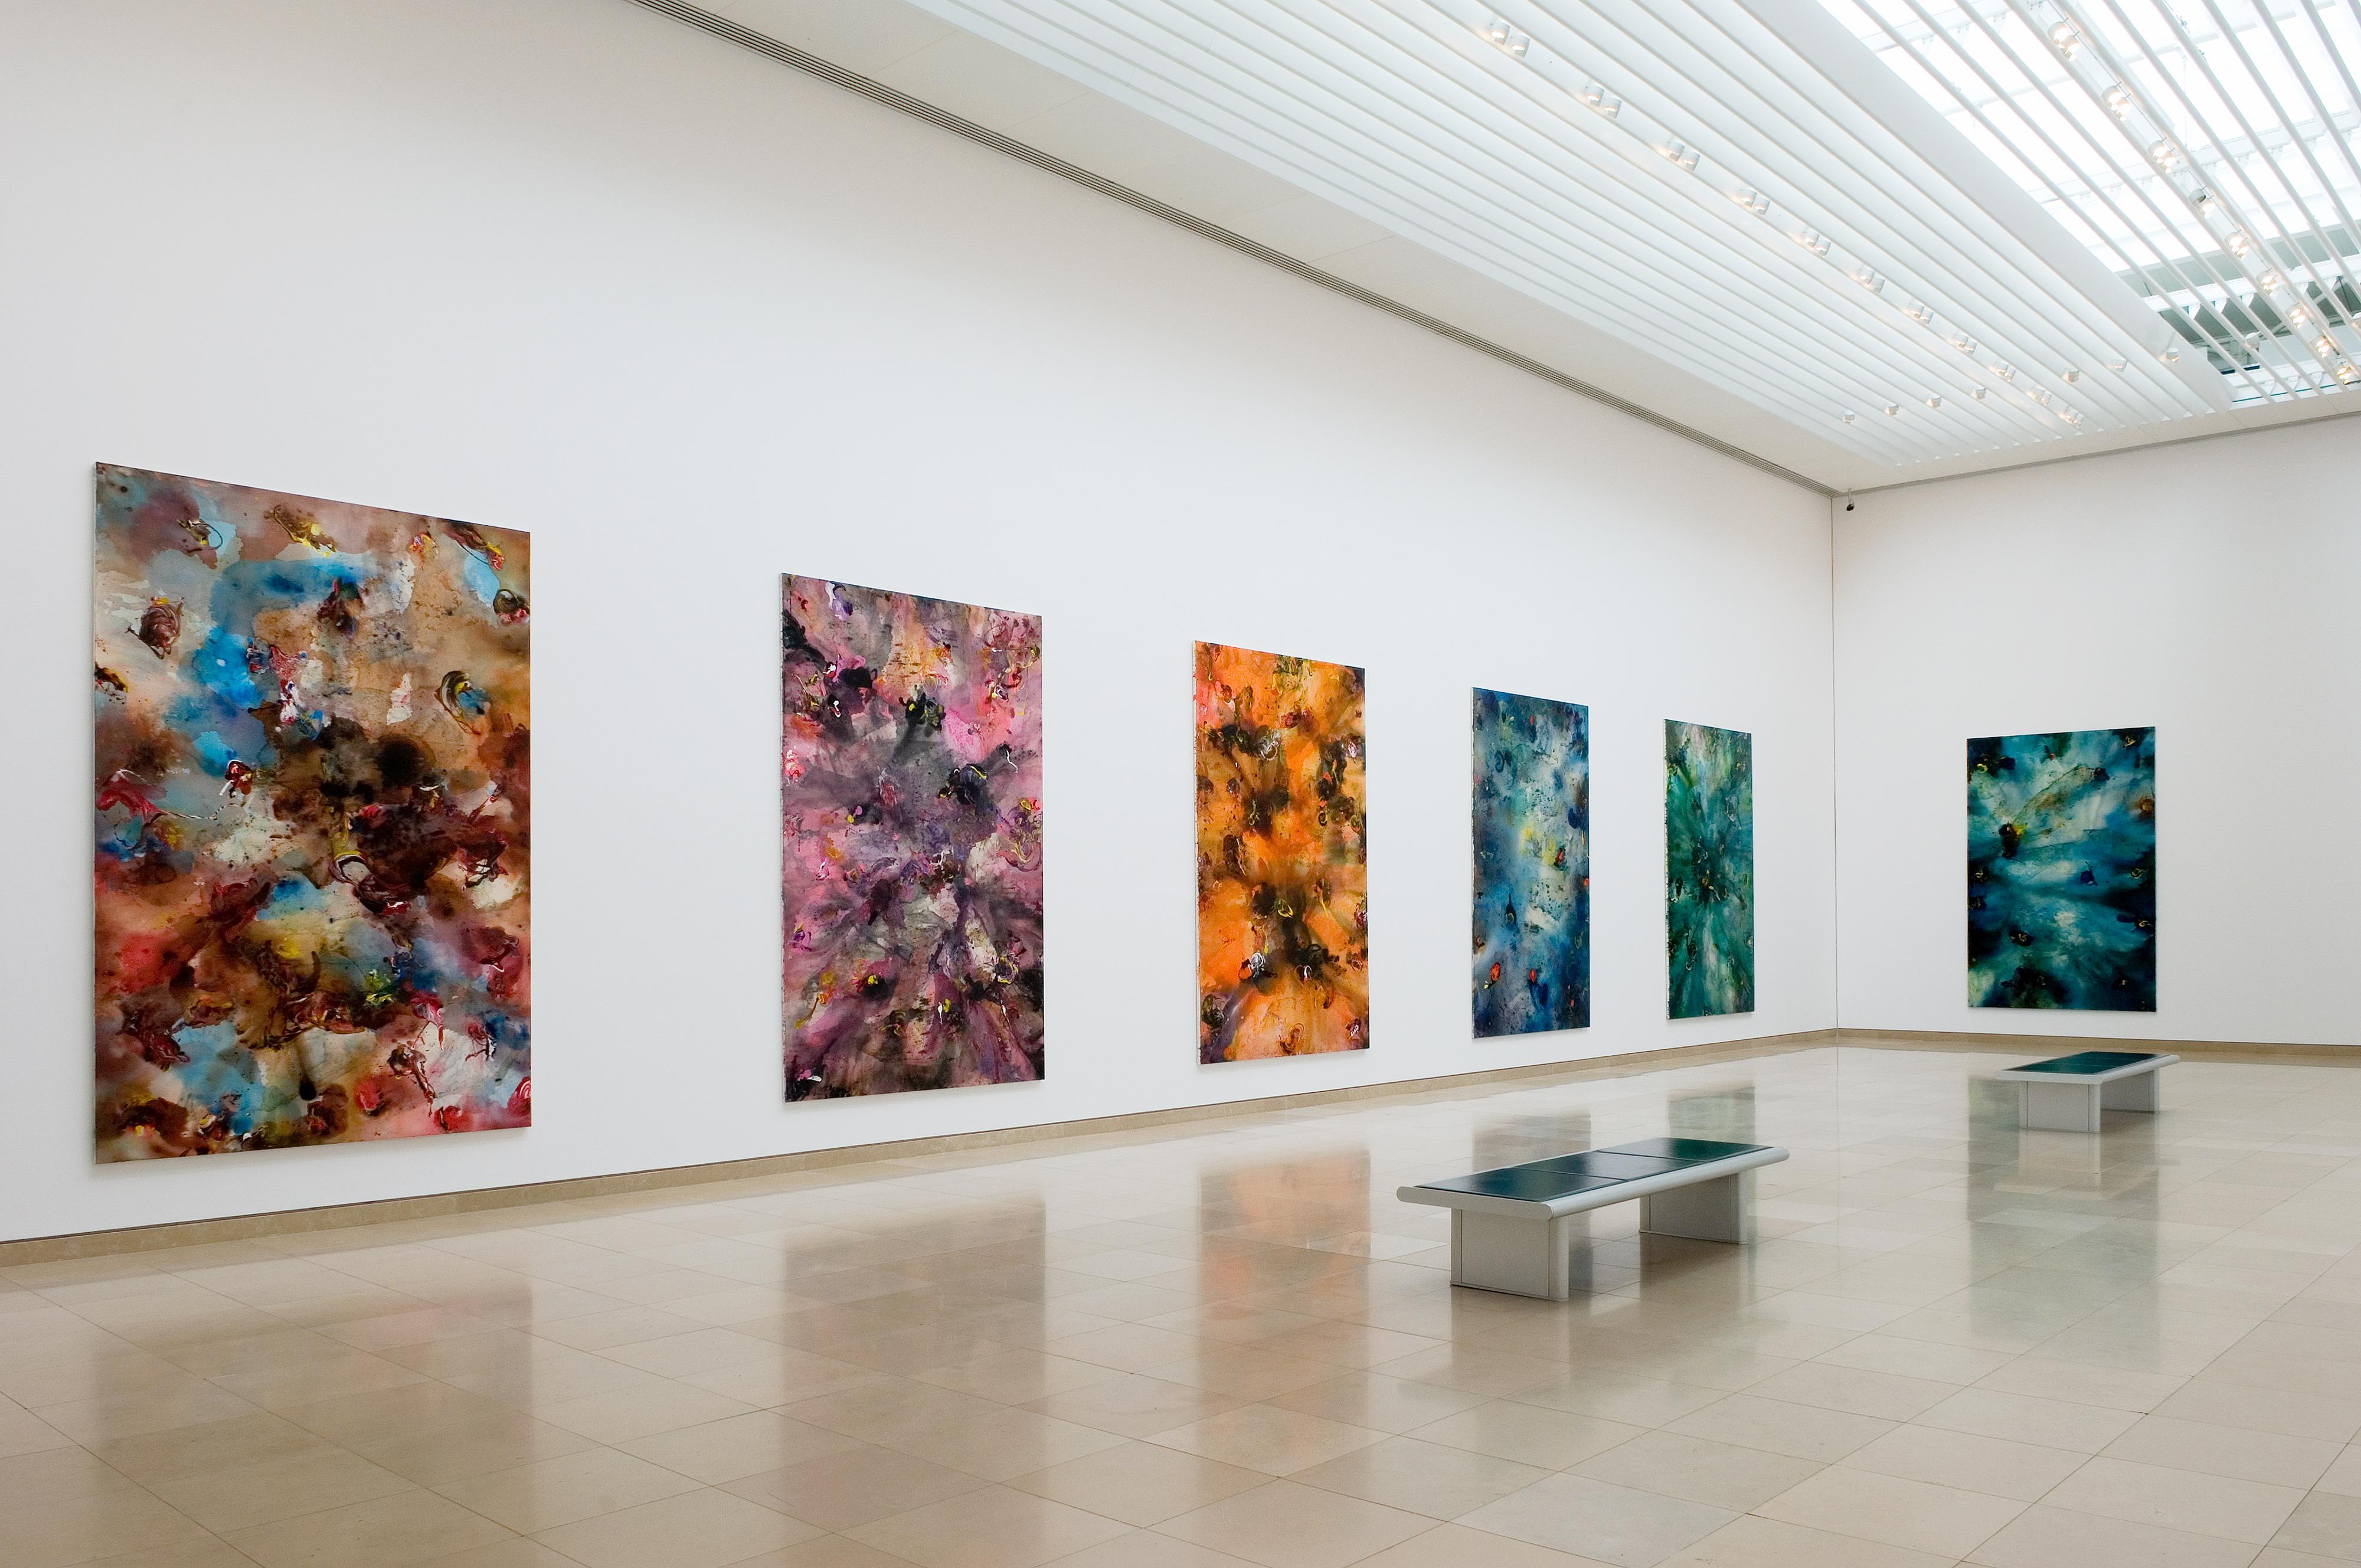 Galerie Barbara Thumm \ Valérie Favre – Visions